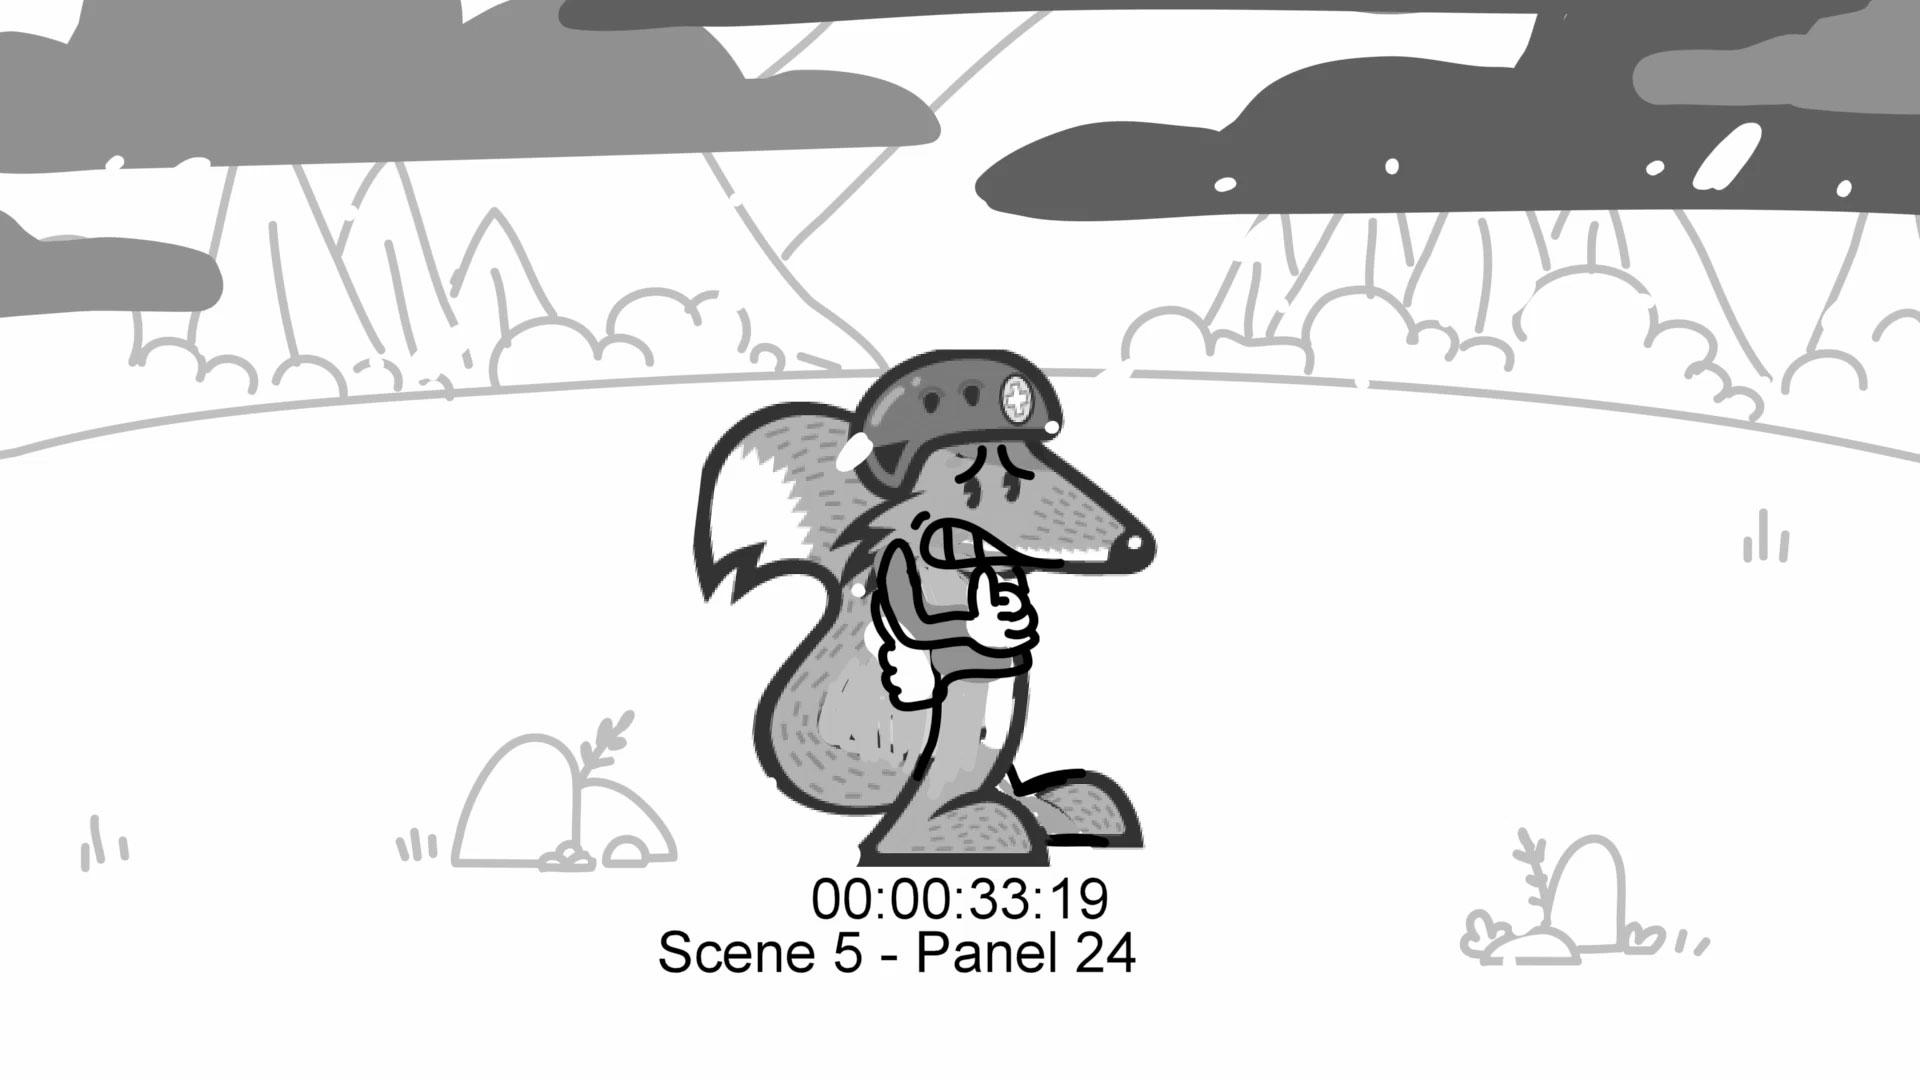 soccorso_alpino_animation_character_racoonstudio_motion_design_9